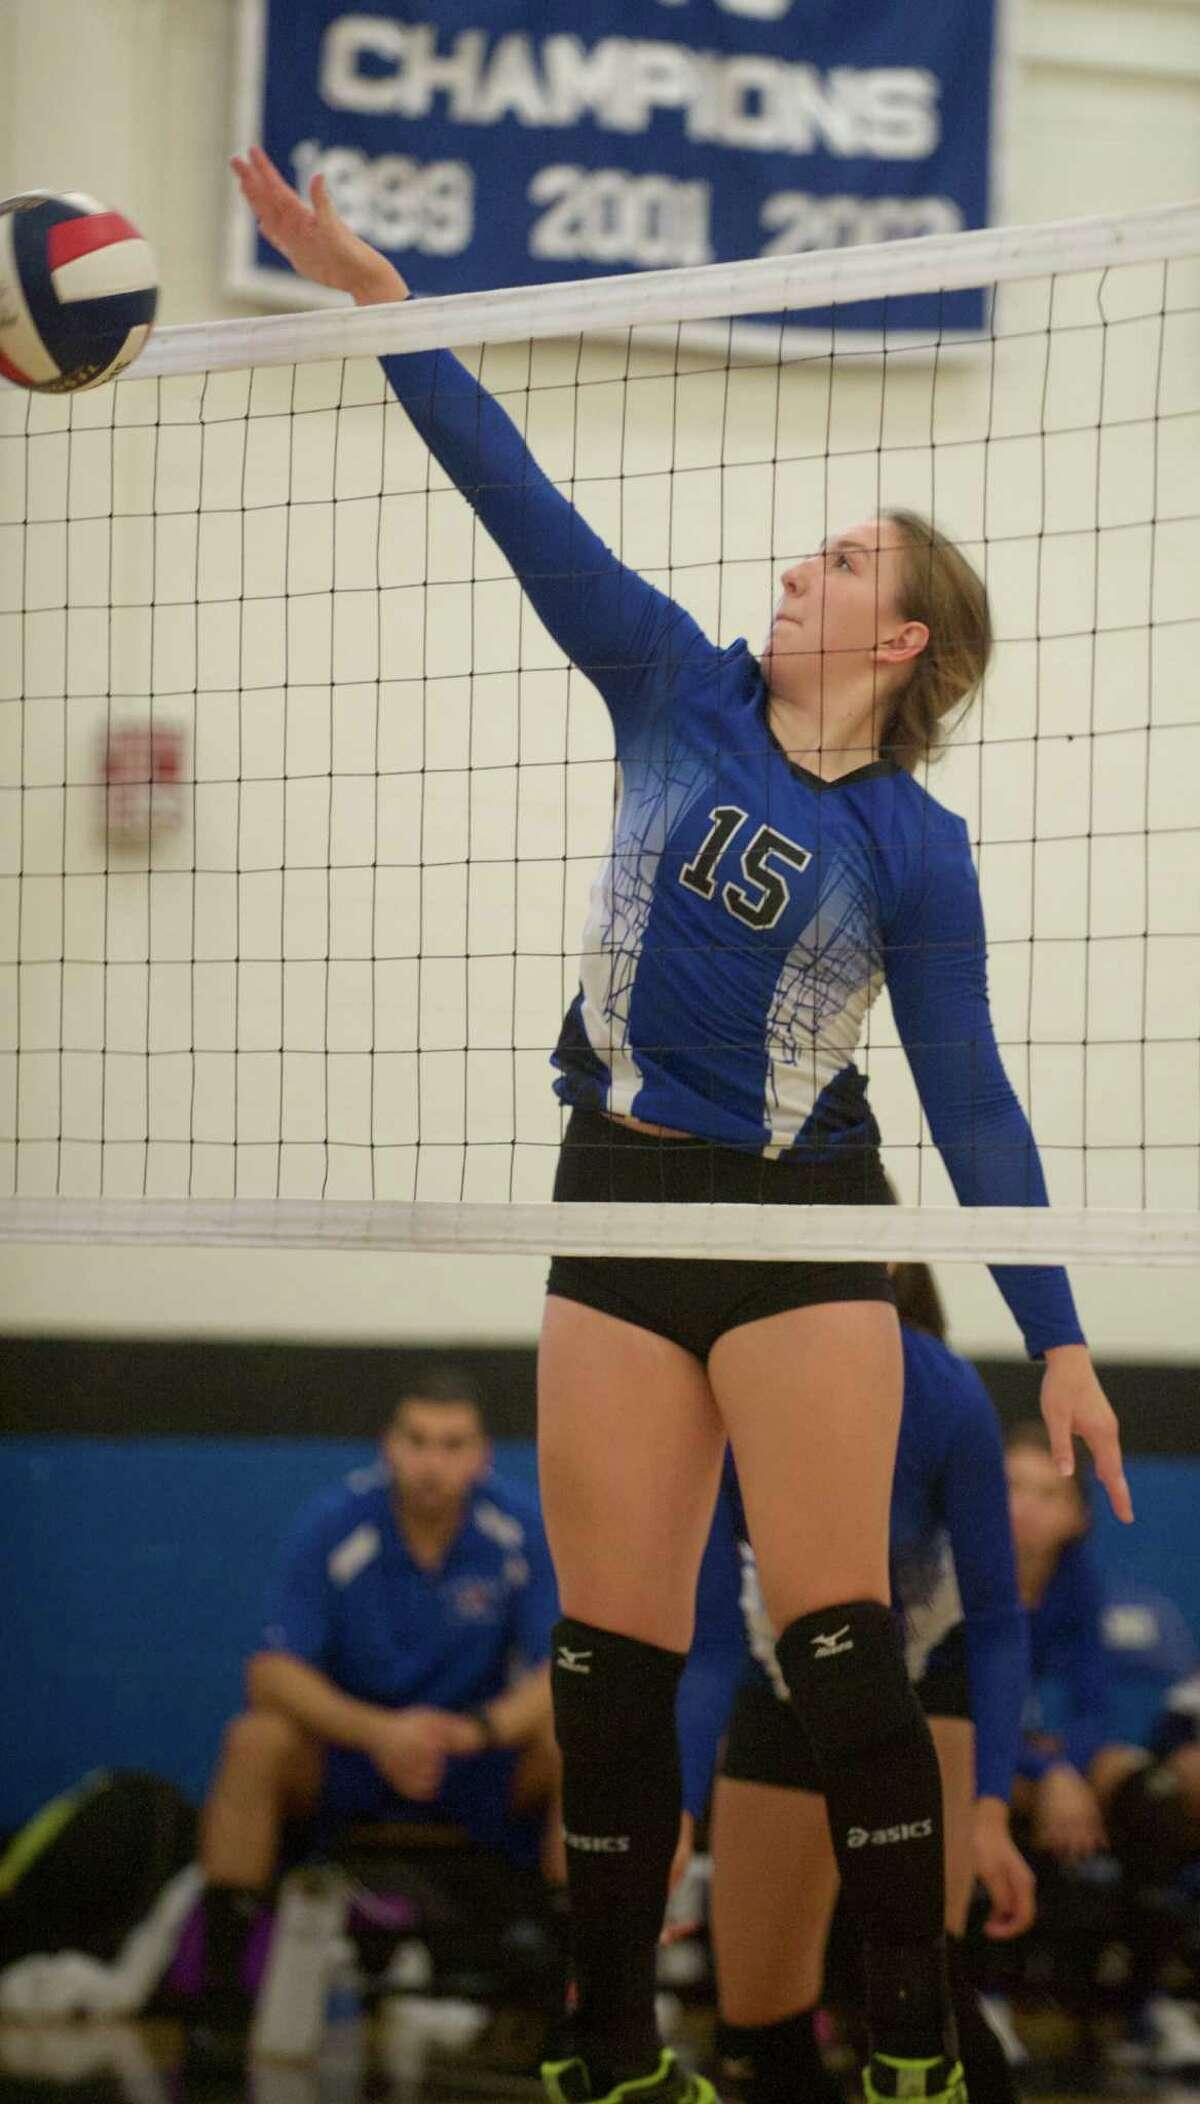 Tech's Marissa Shamansky (15) goes up for a block during the girls high school volleyball game between Bullard Haven and Abbott Tech, on Wednesday, September 24, 2014, in Danbury, Conn.